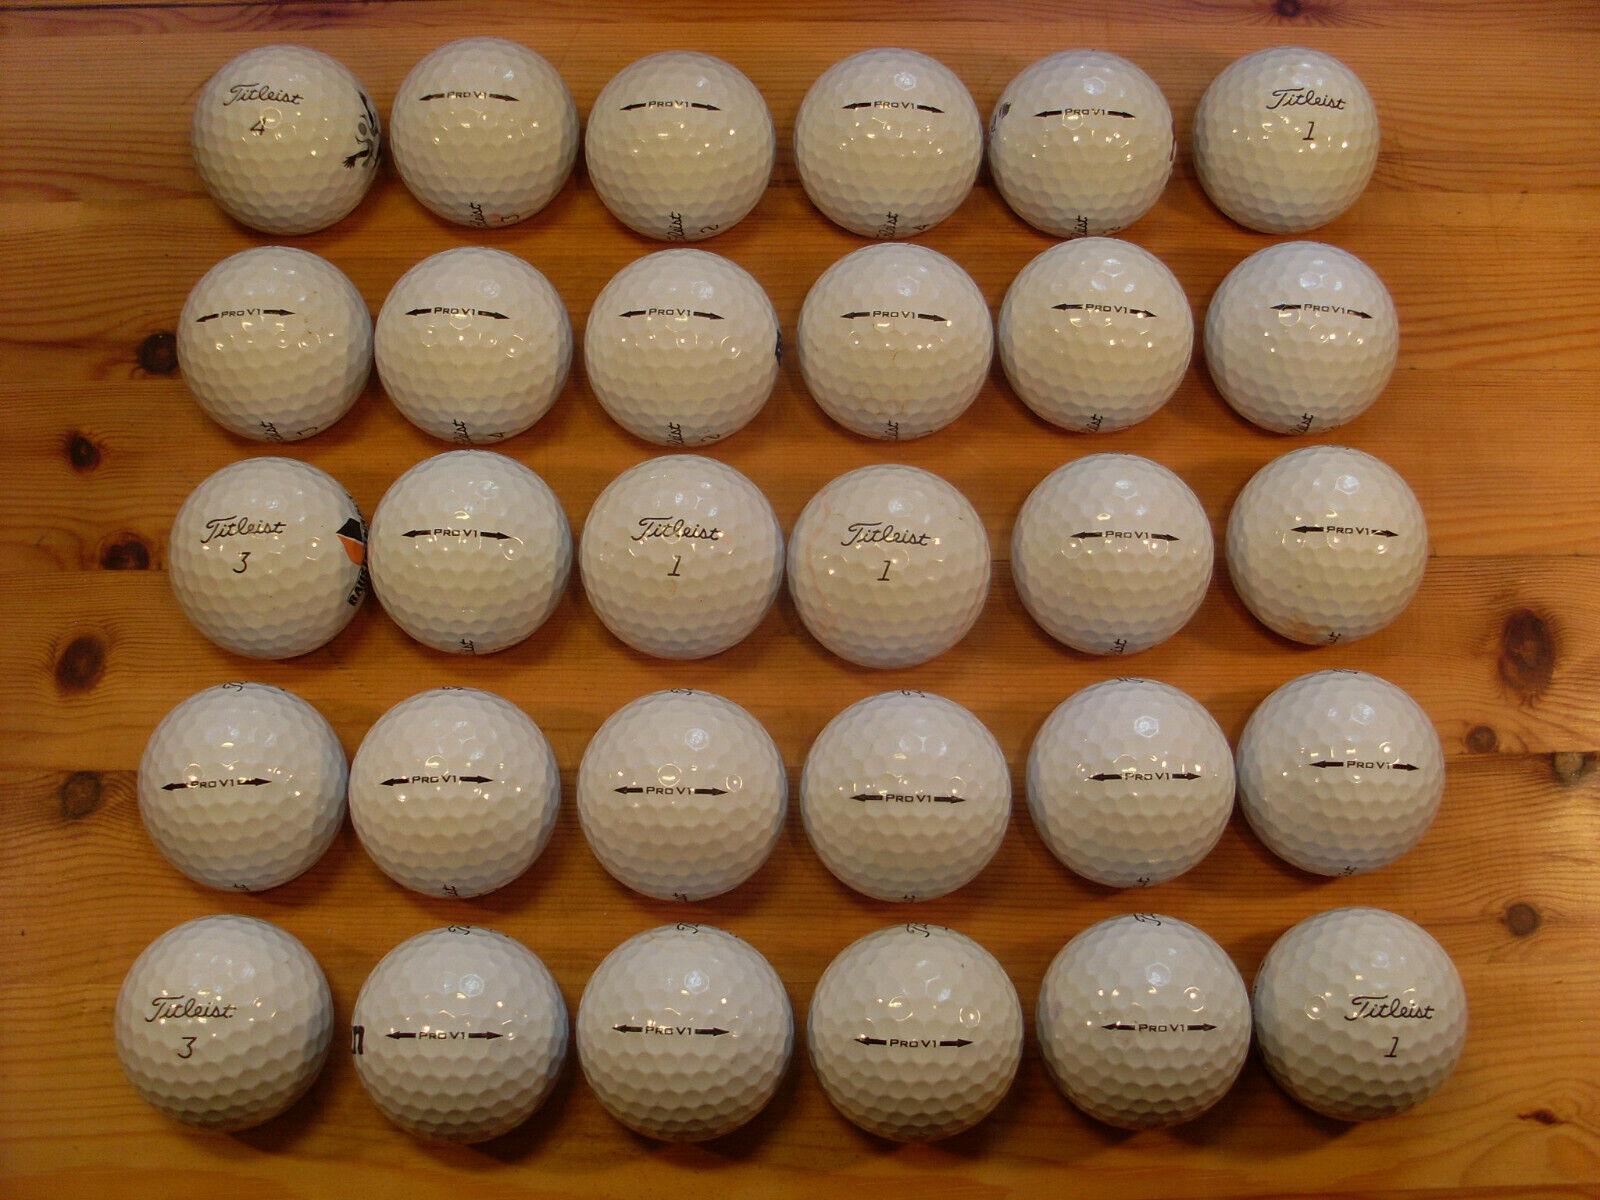 30 TITLEIST PRO V1 gebrauchte Golfbälle Lakeballs